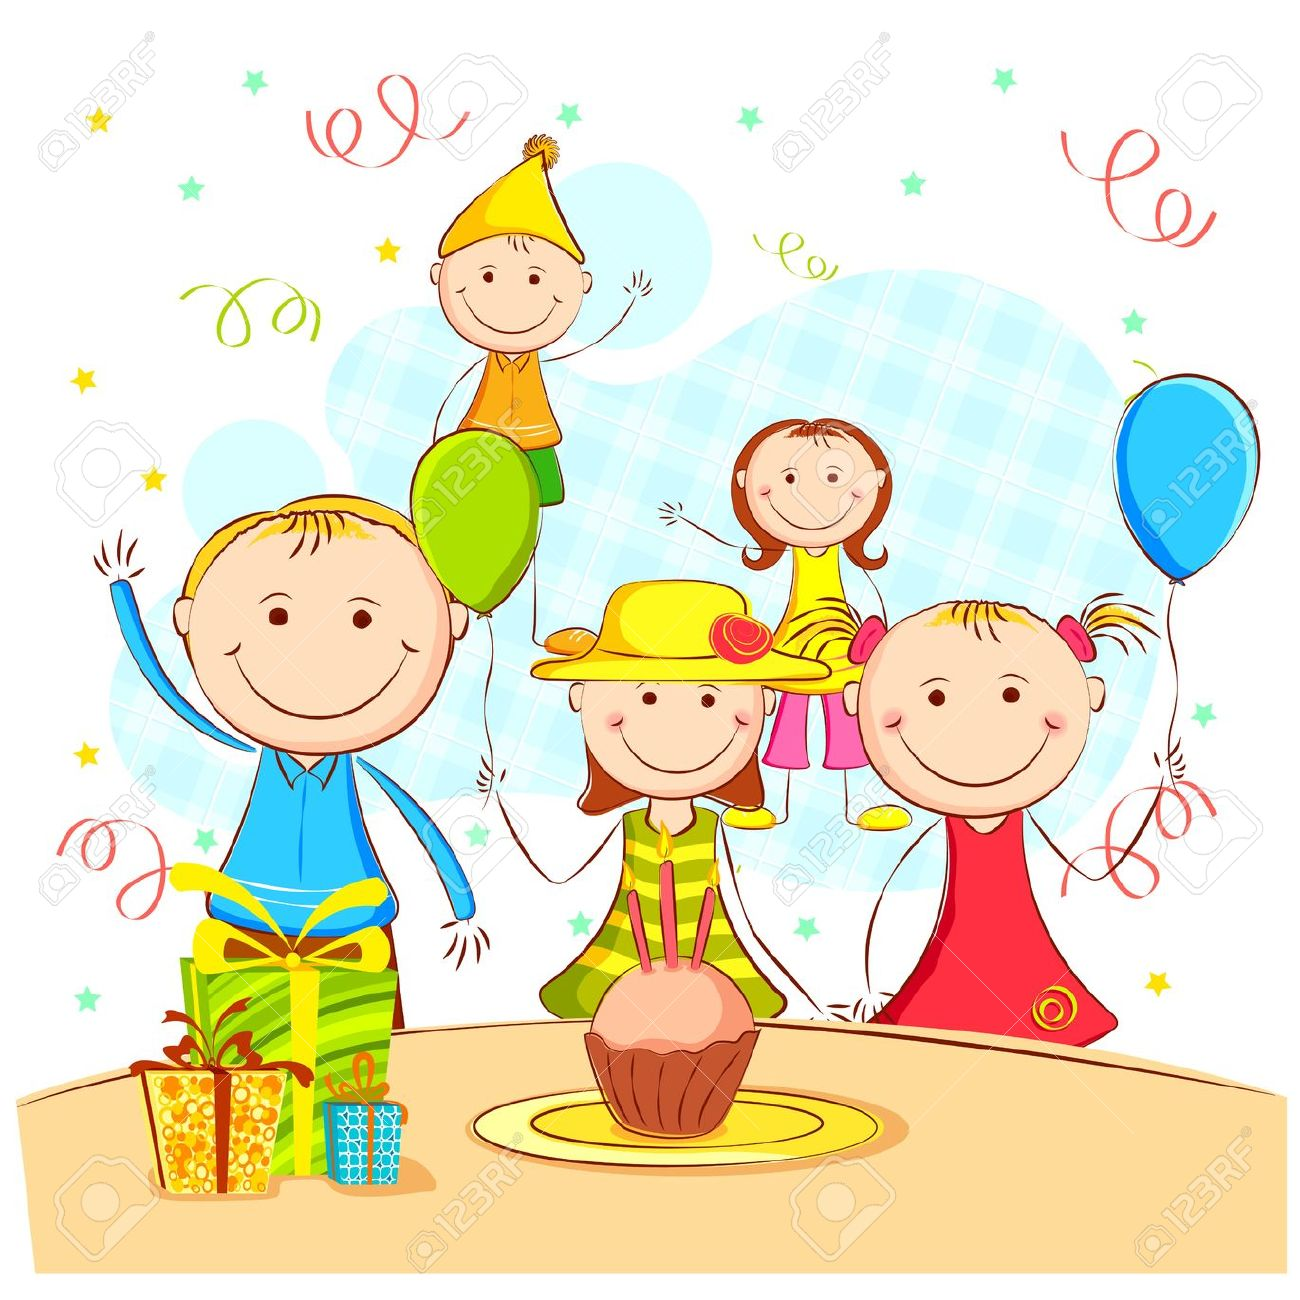 Geburtstag feiern clipart jpg transparent Geburtstag feiern clipart - ClipartFest jpg transparent